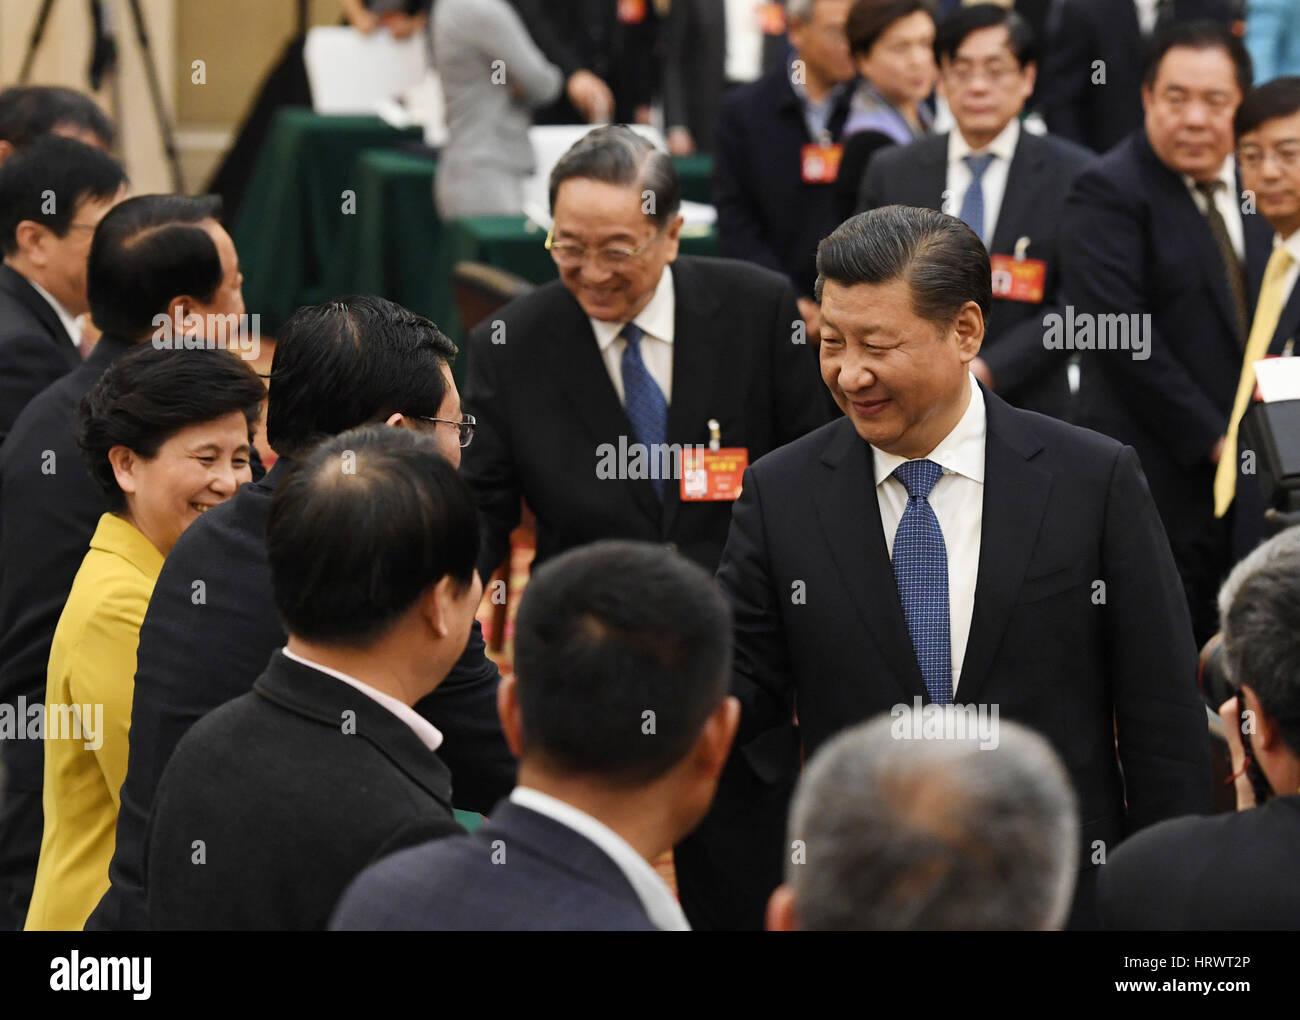 Beijing, China. 4th Mar, 2017. Chinese President Xi Jinping joins ...